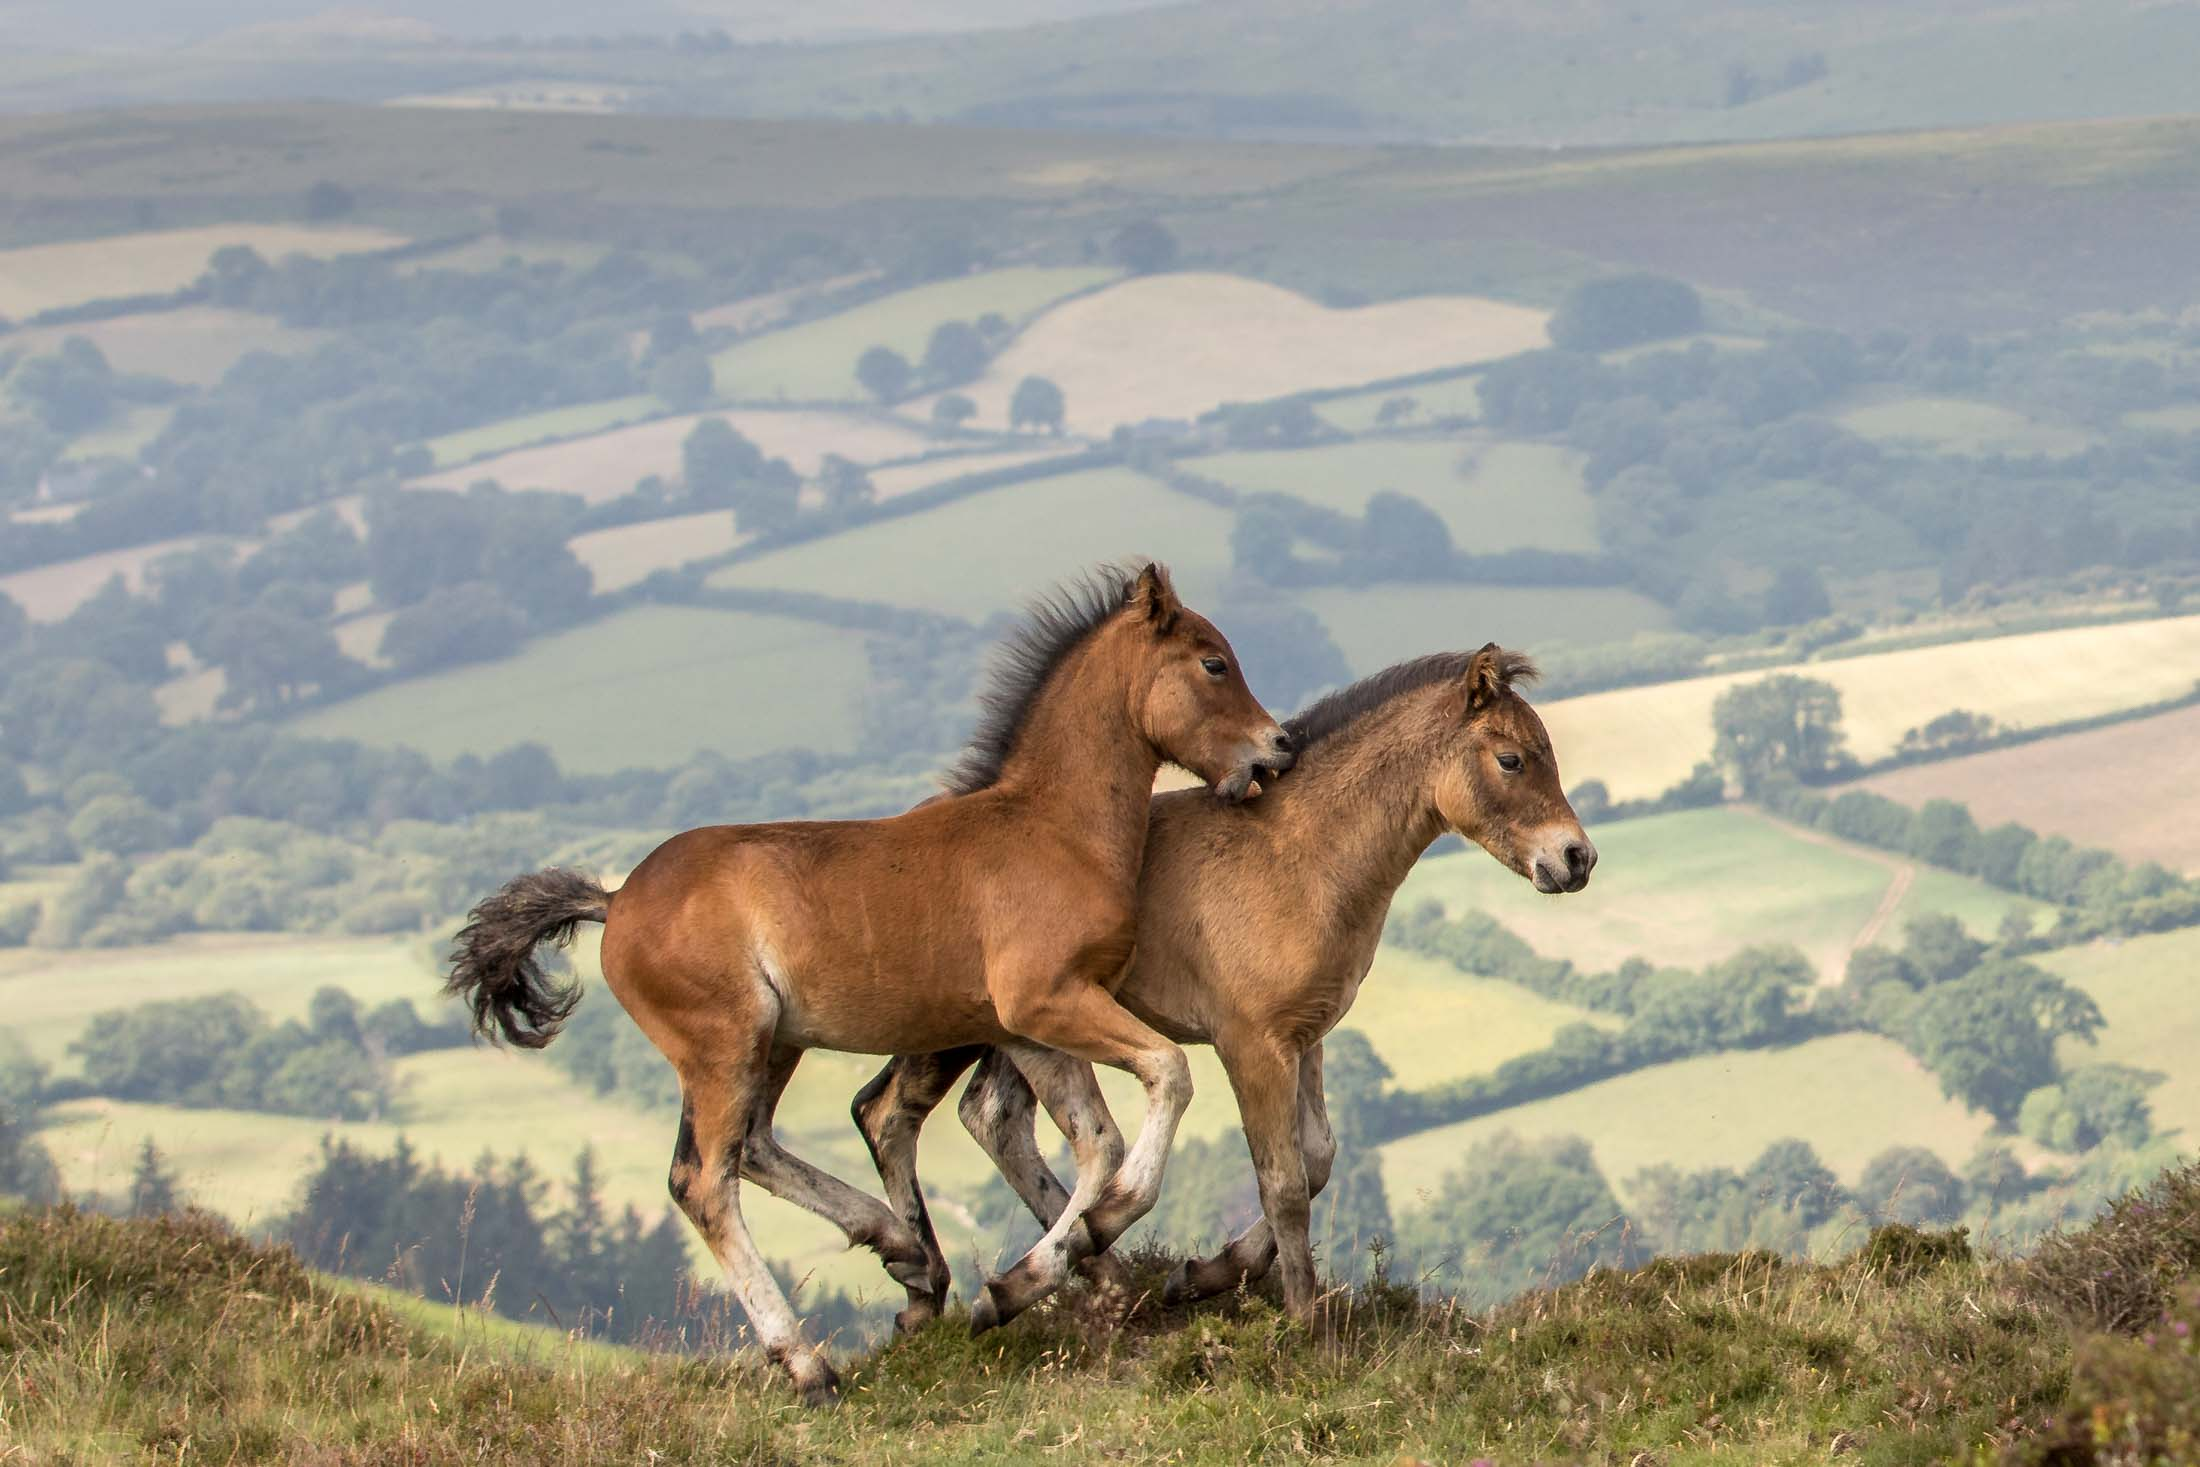 Dartmoor Pony Foals at Play